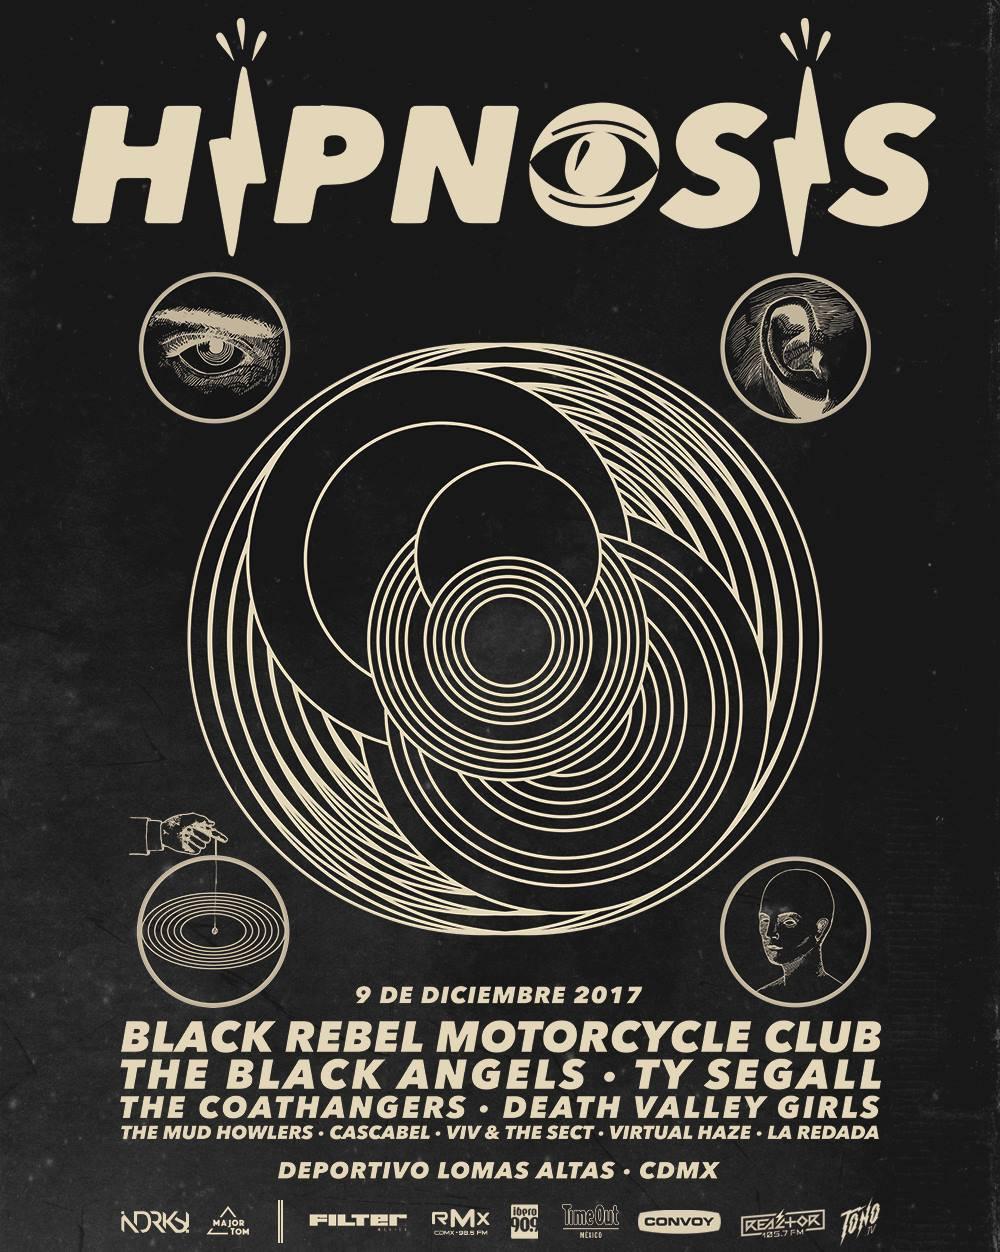 www.lifeboxset.com-hipnosis-cartel-cdmx-image-uploaded-from-ios-1.jpg